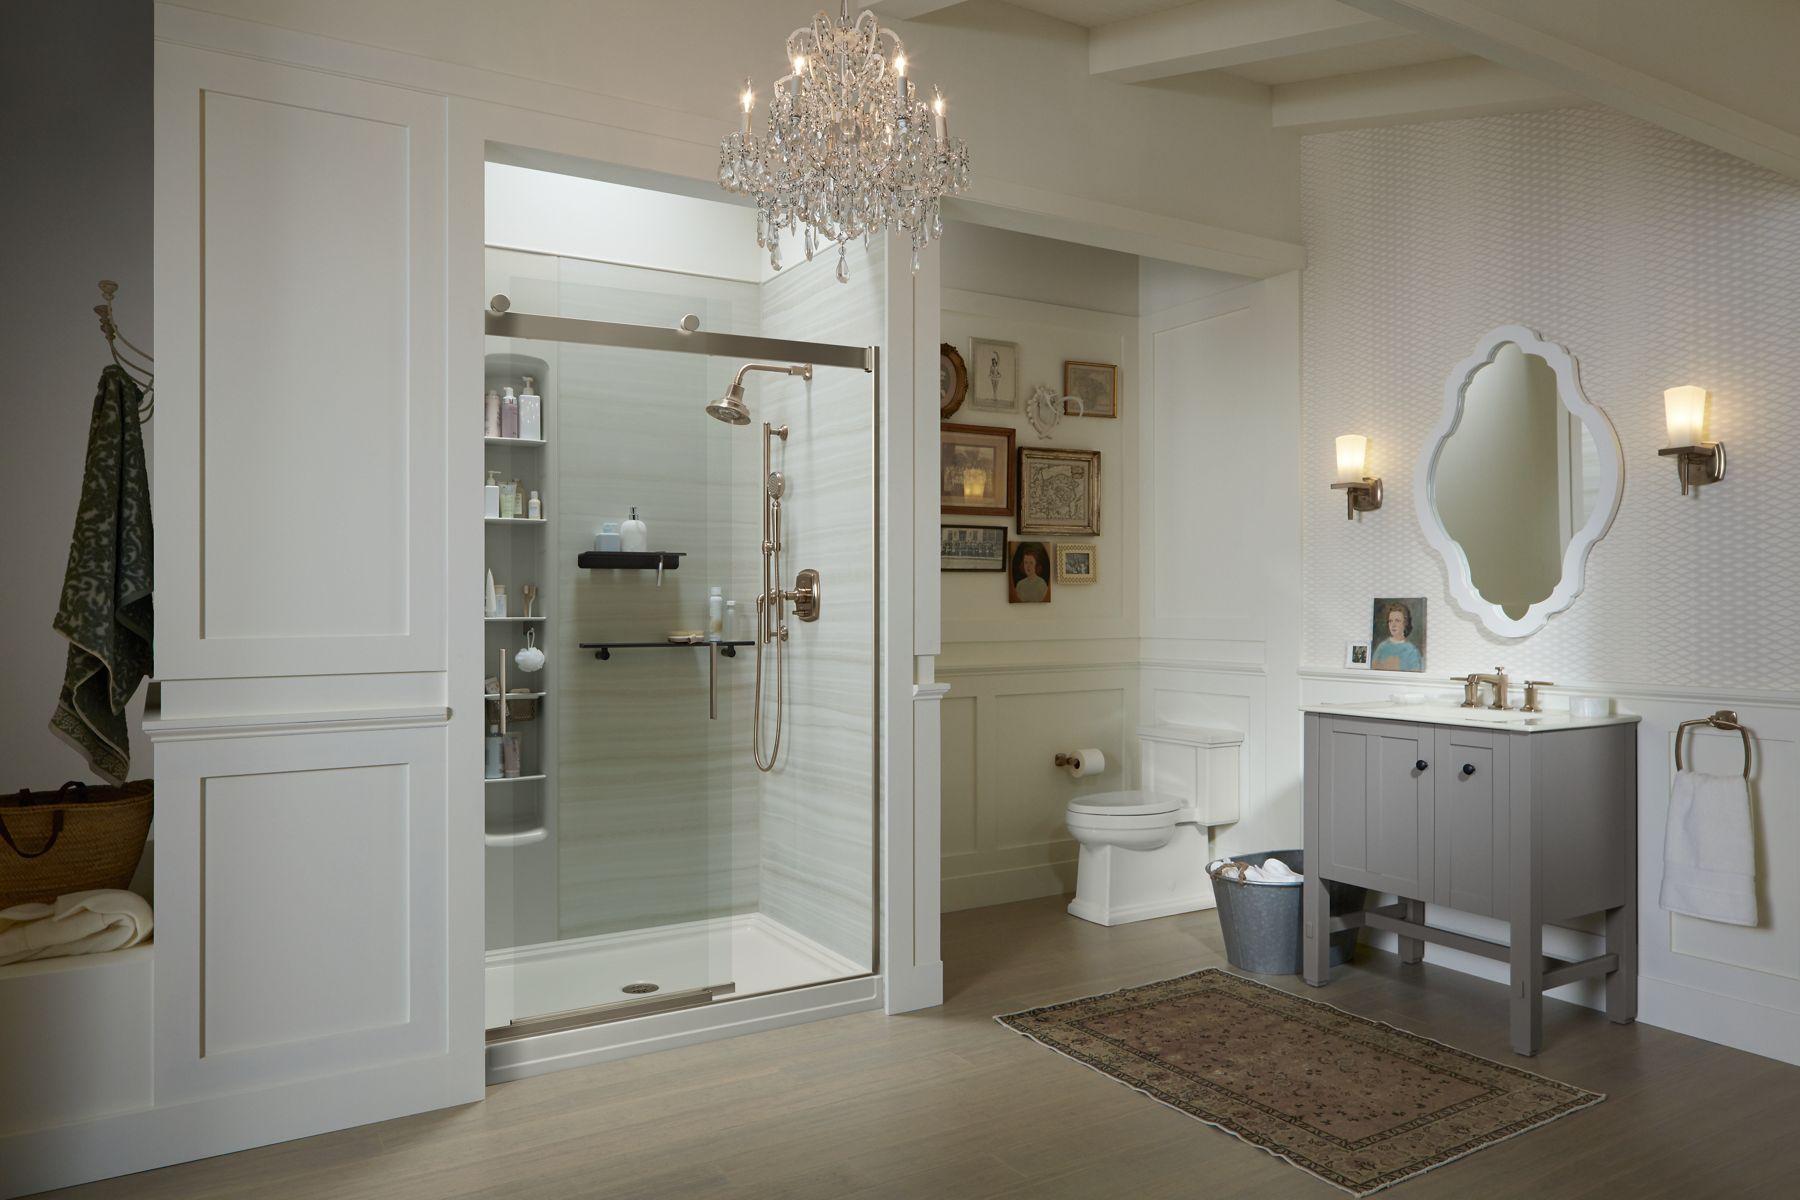 Afri glass tub shower divider asian pants